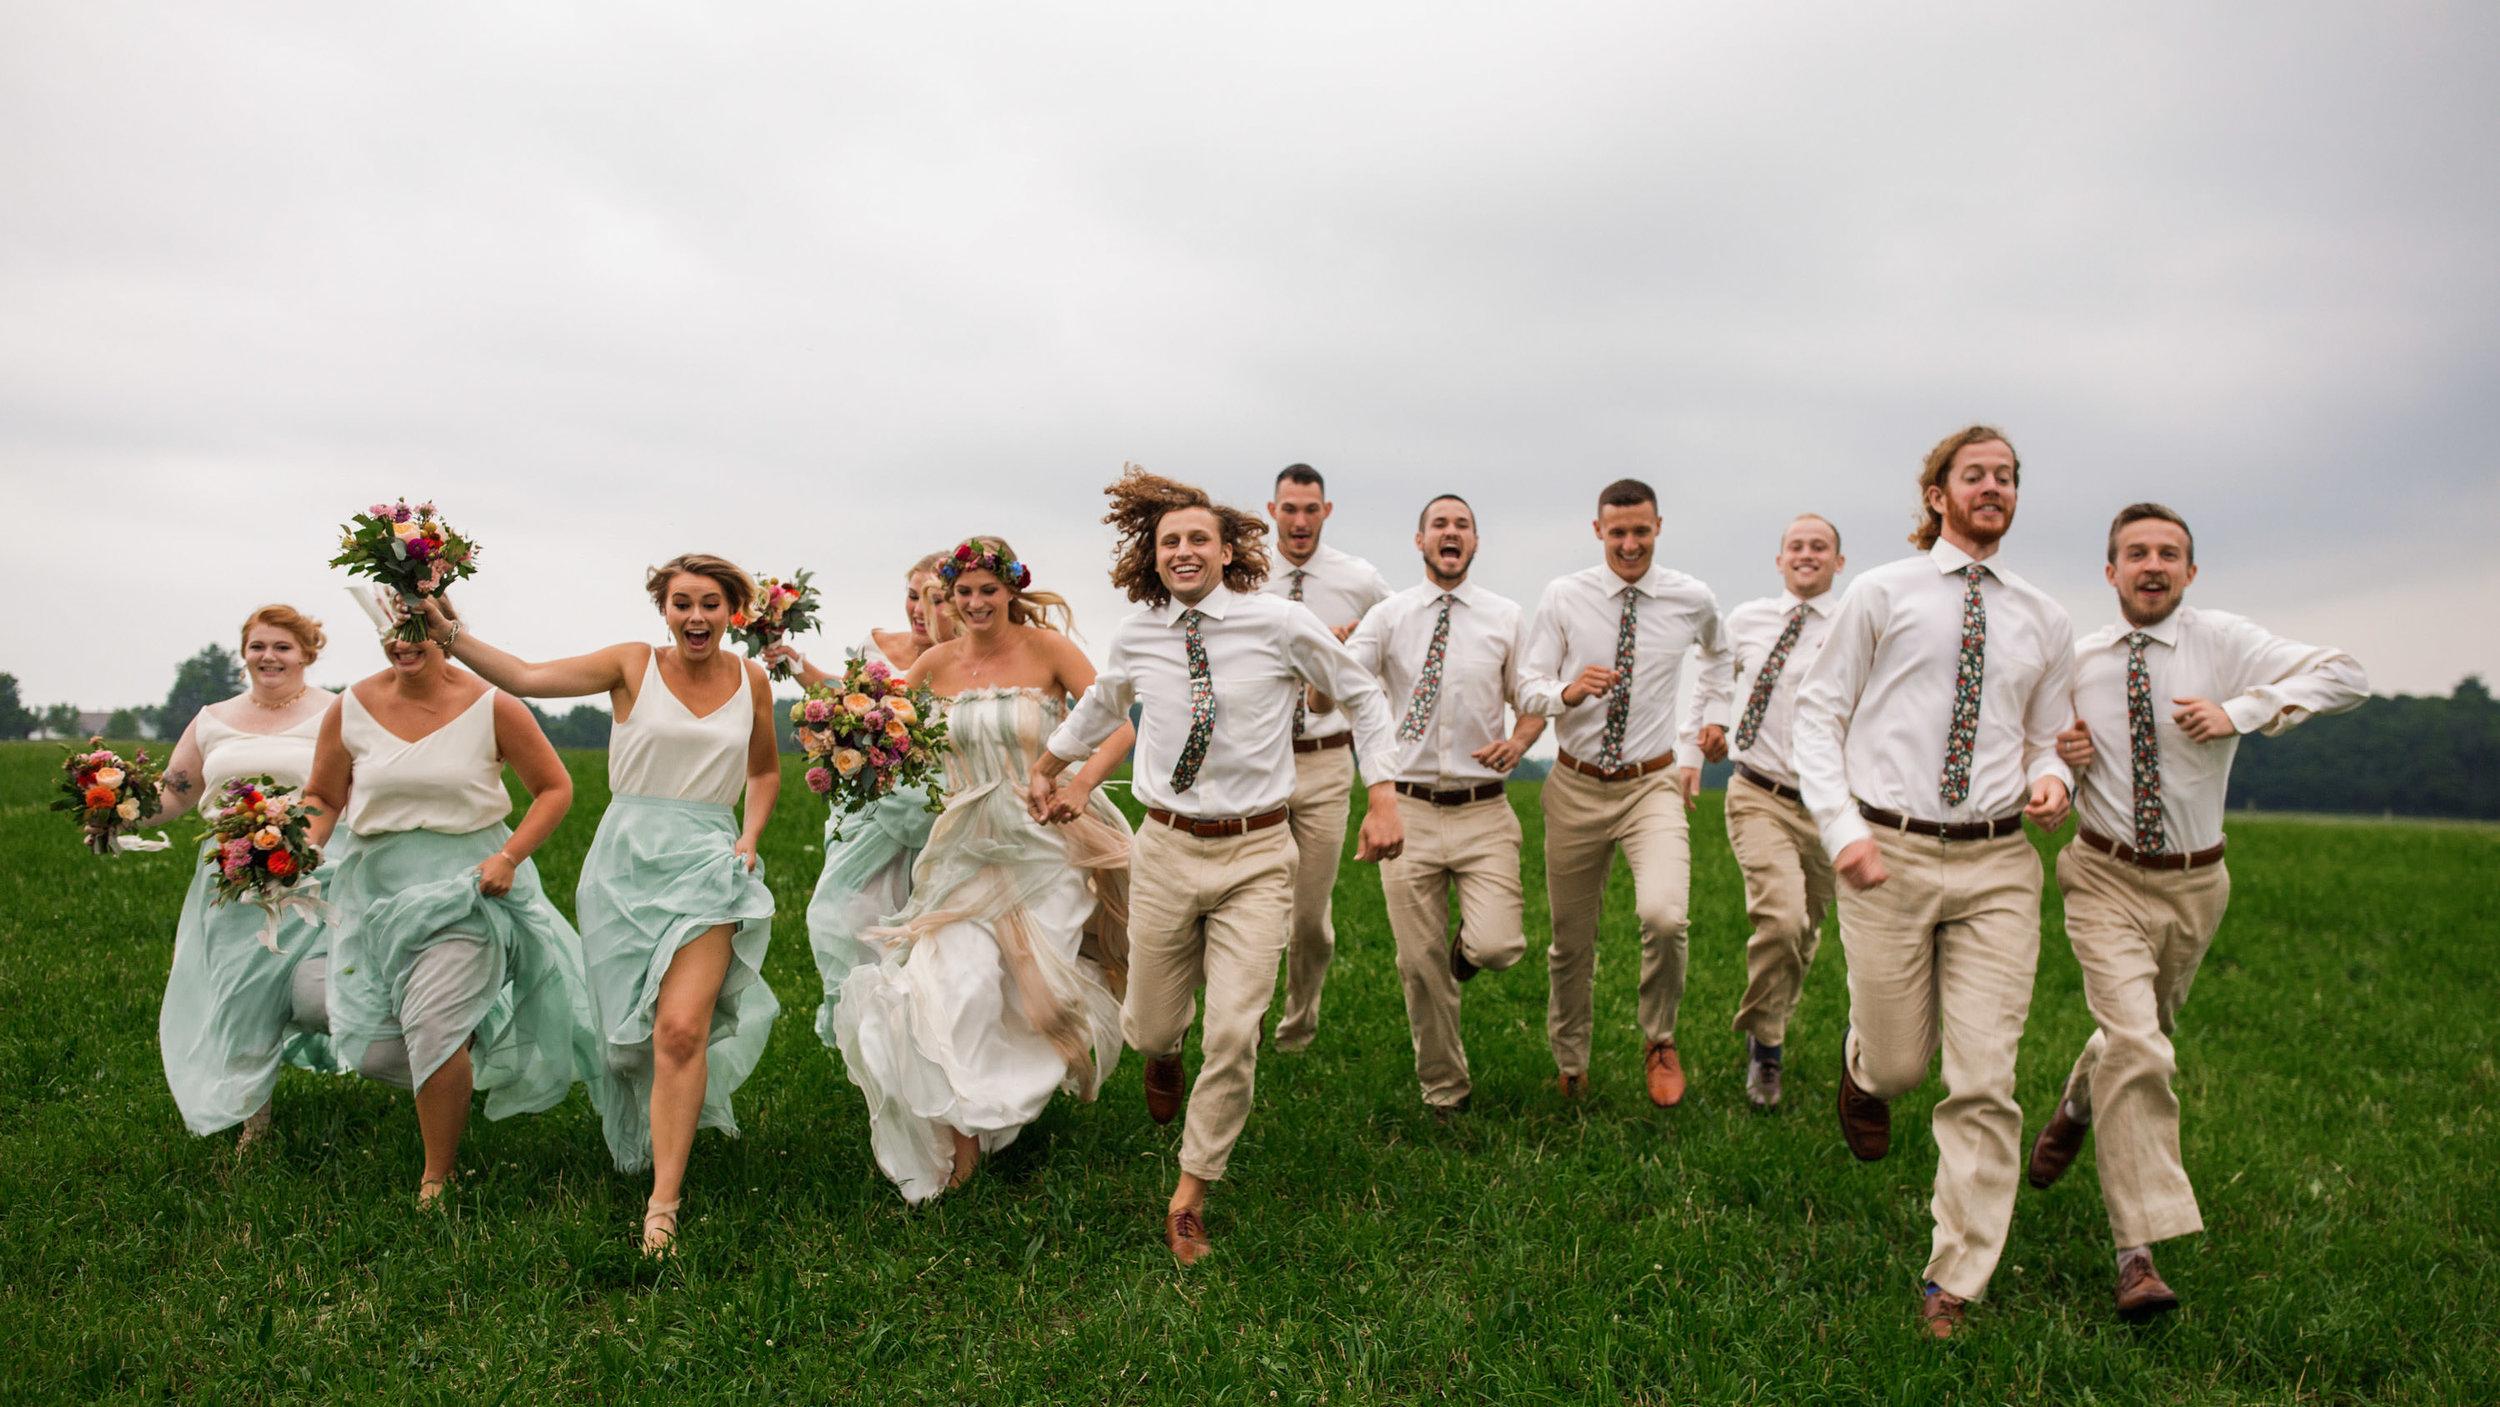 New_York_Wedding_Photographer_2.jpg